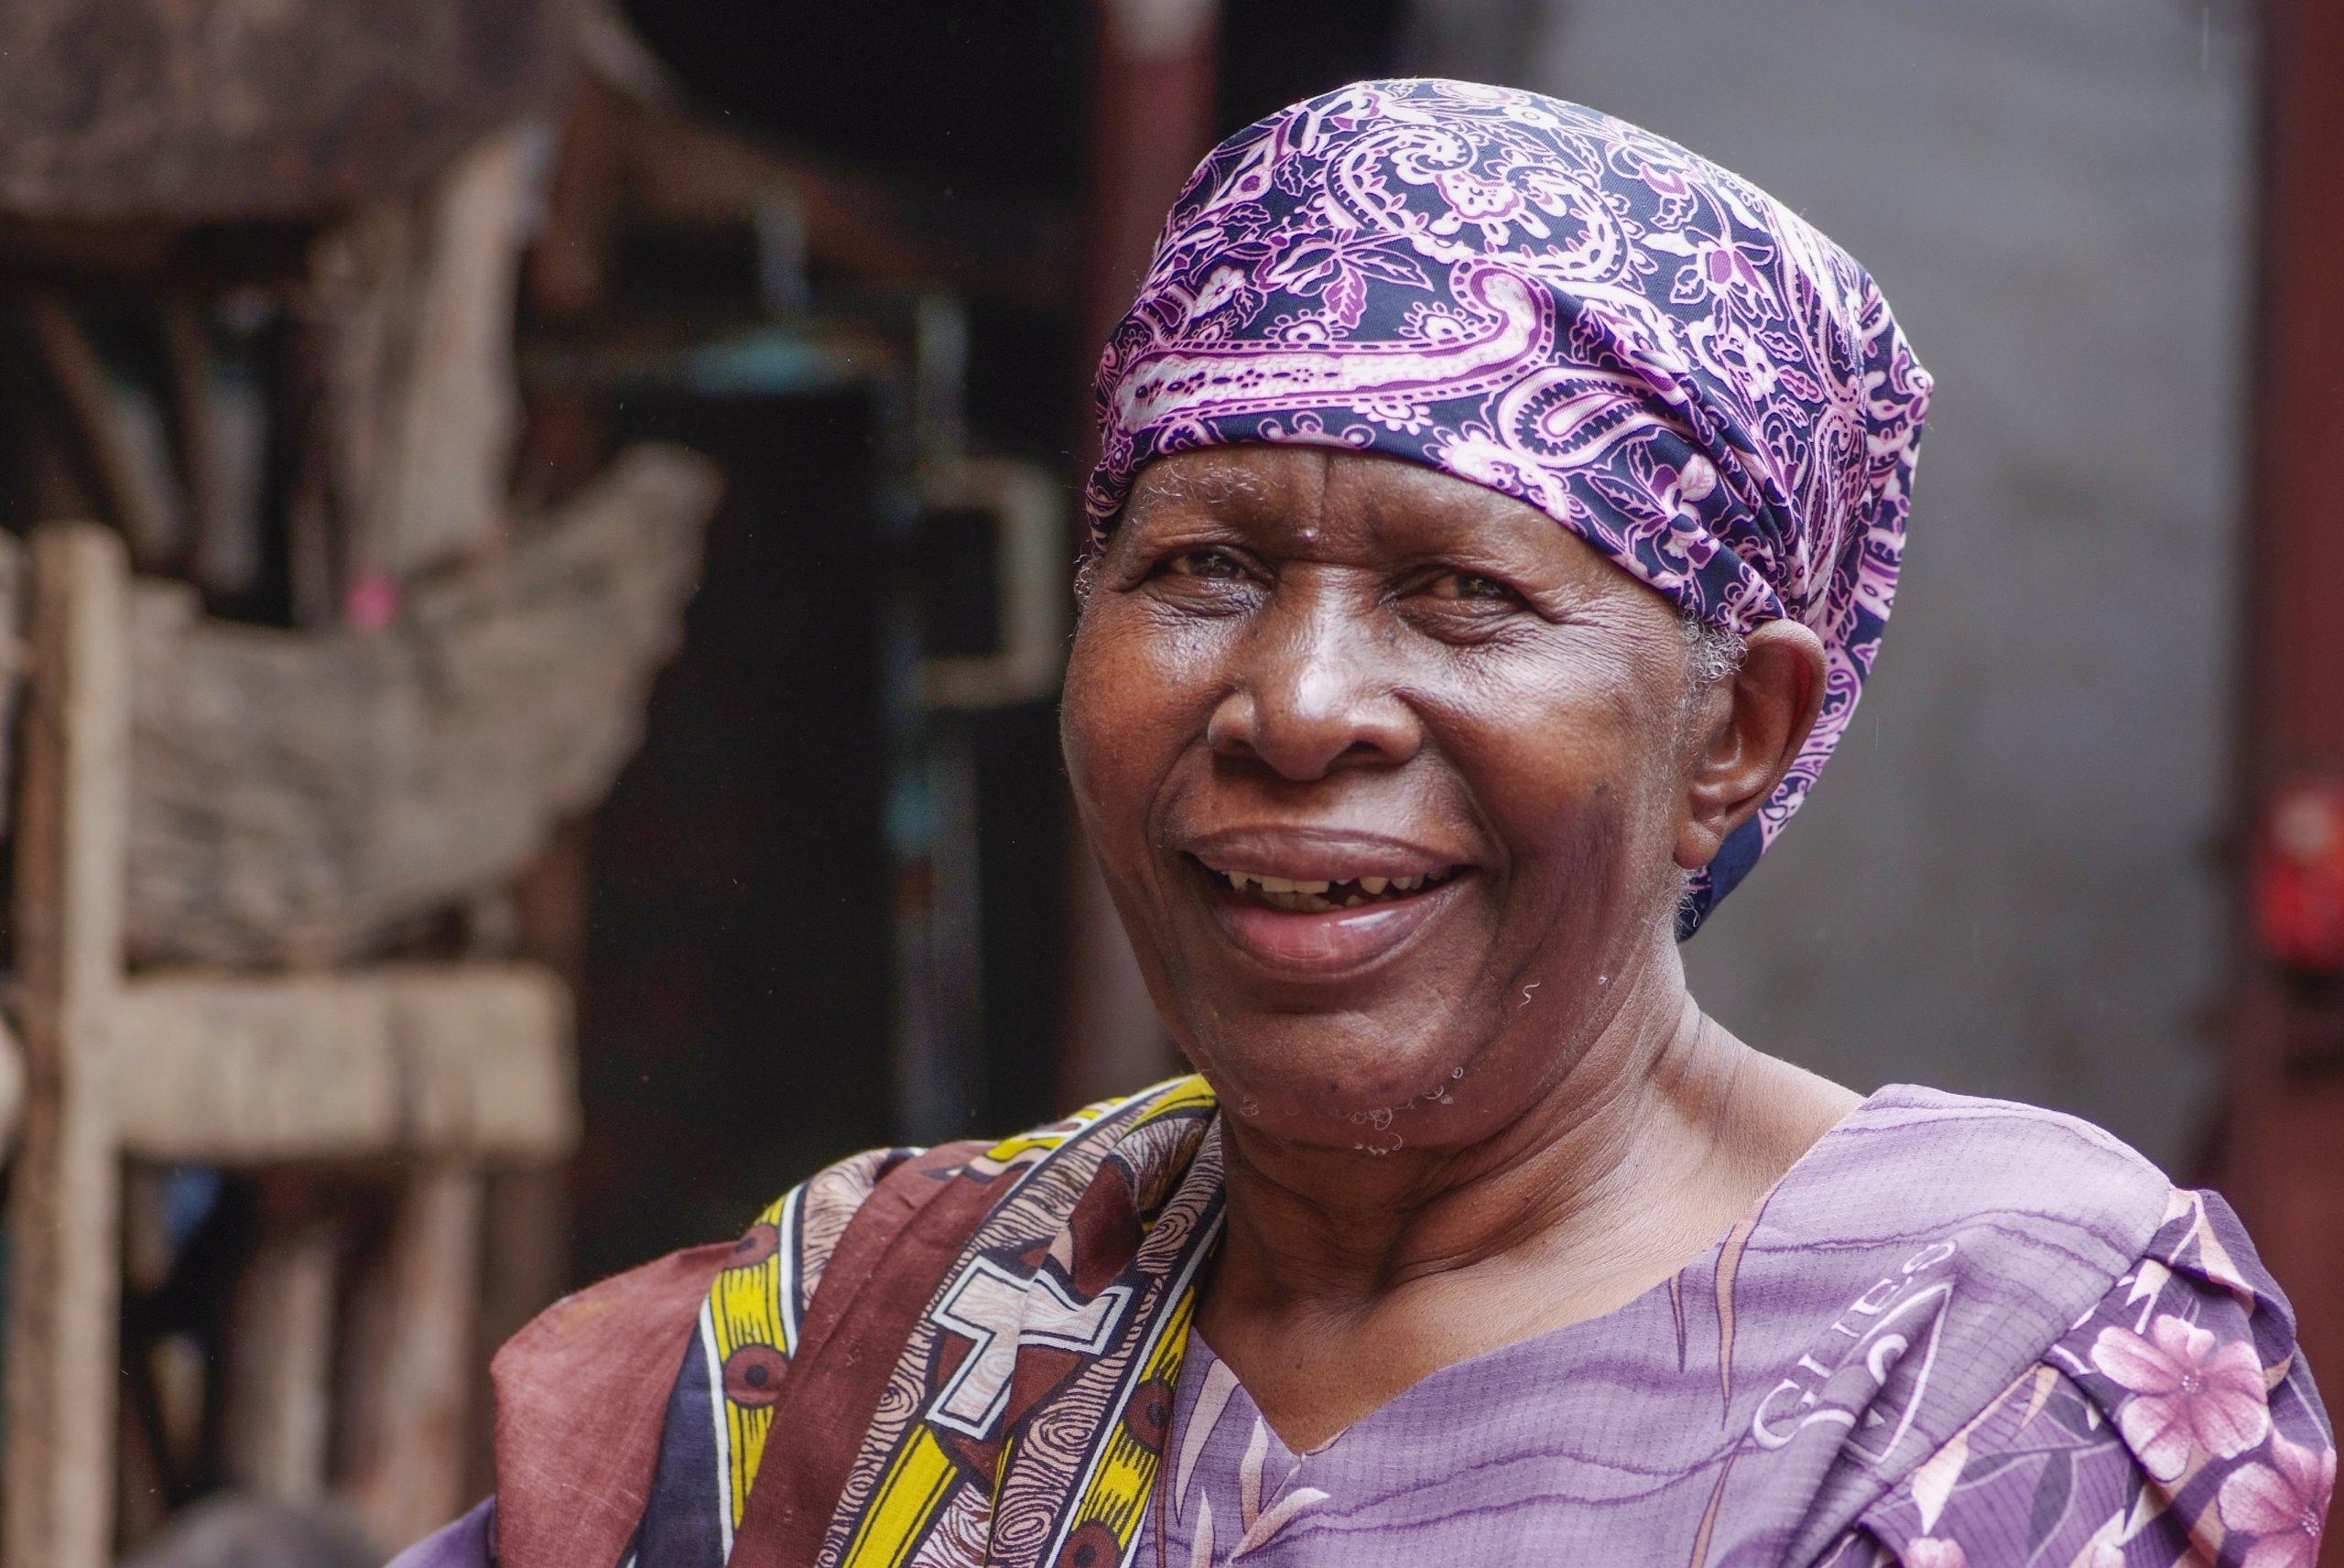 21 02 boerin trotsevrouw Joyce Anne Kibaja Korogwe Tanzania 4890 scaled